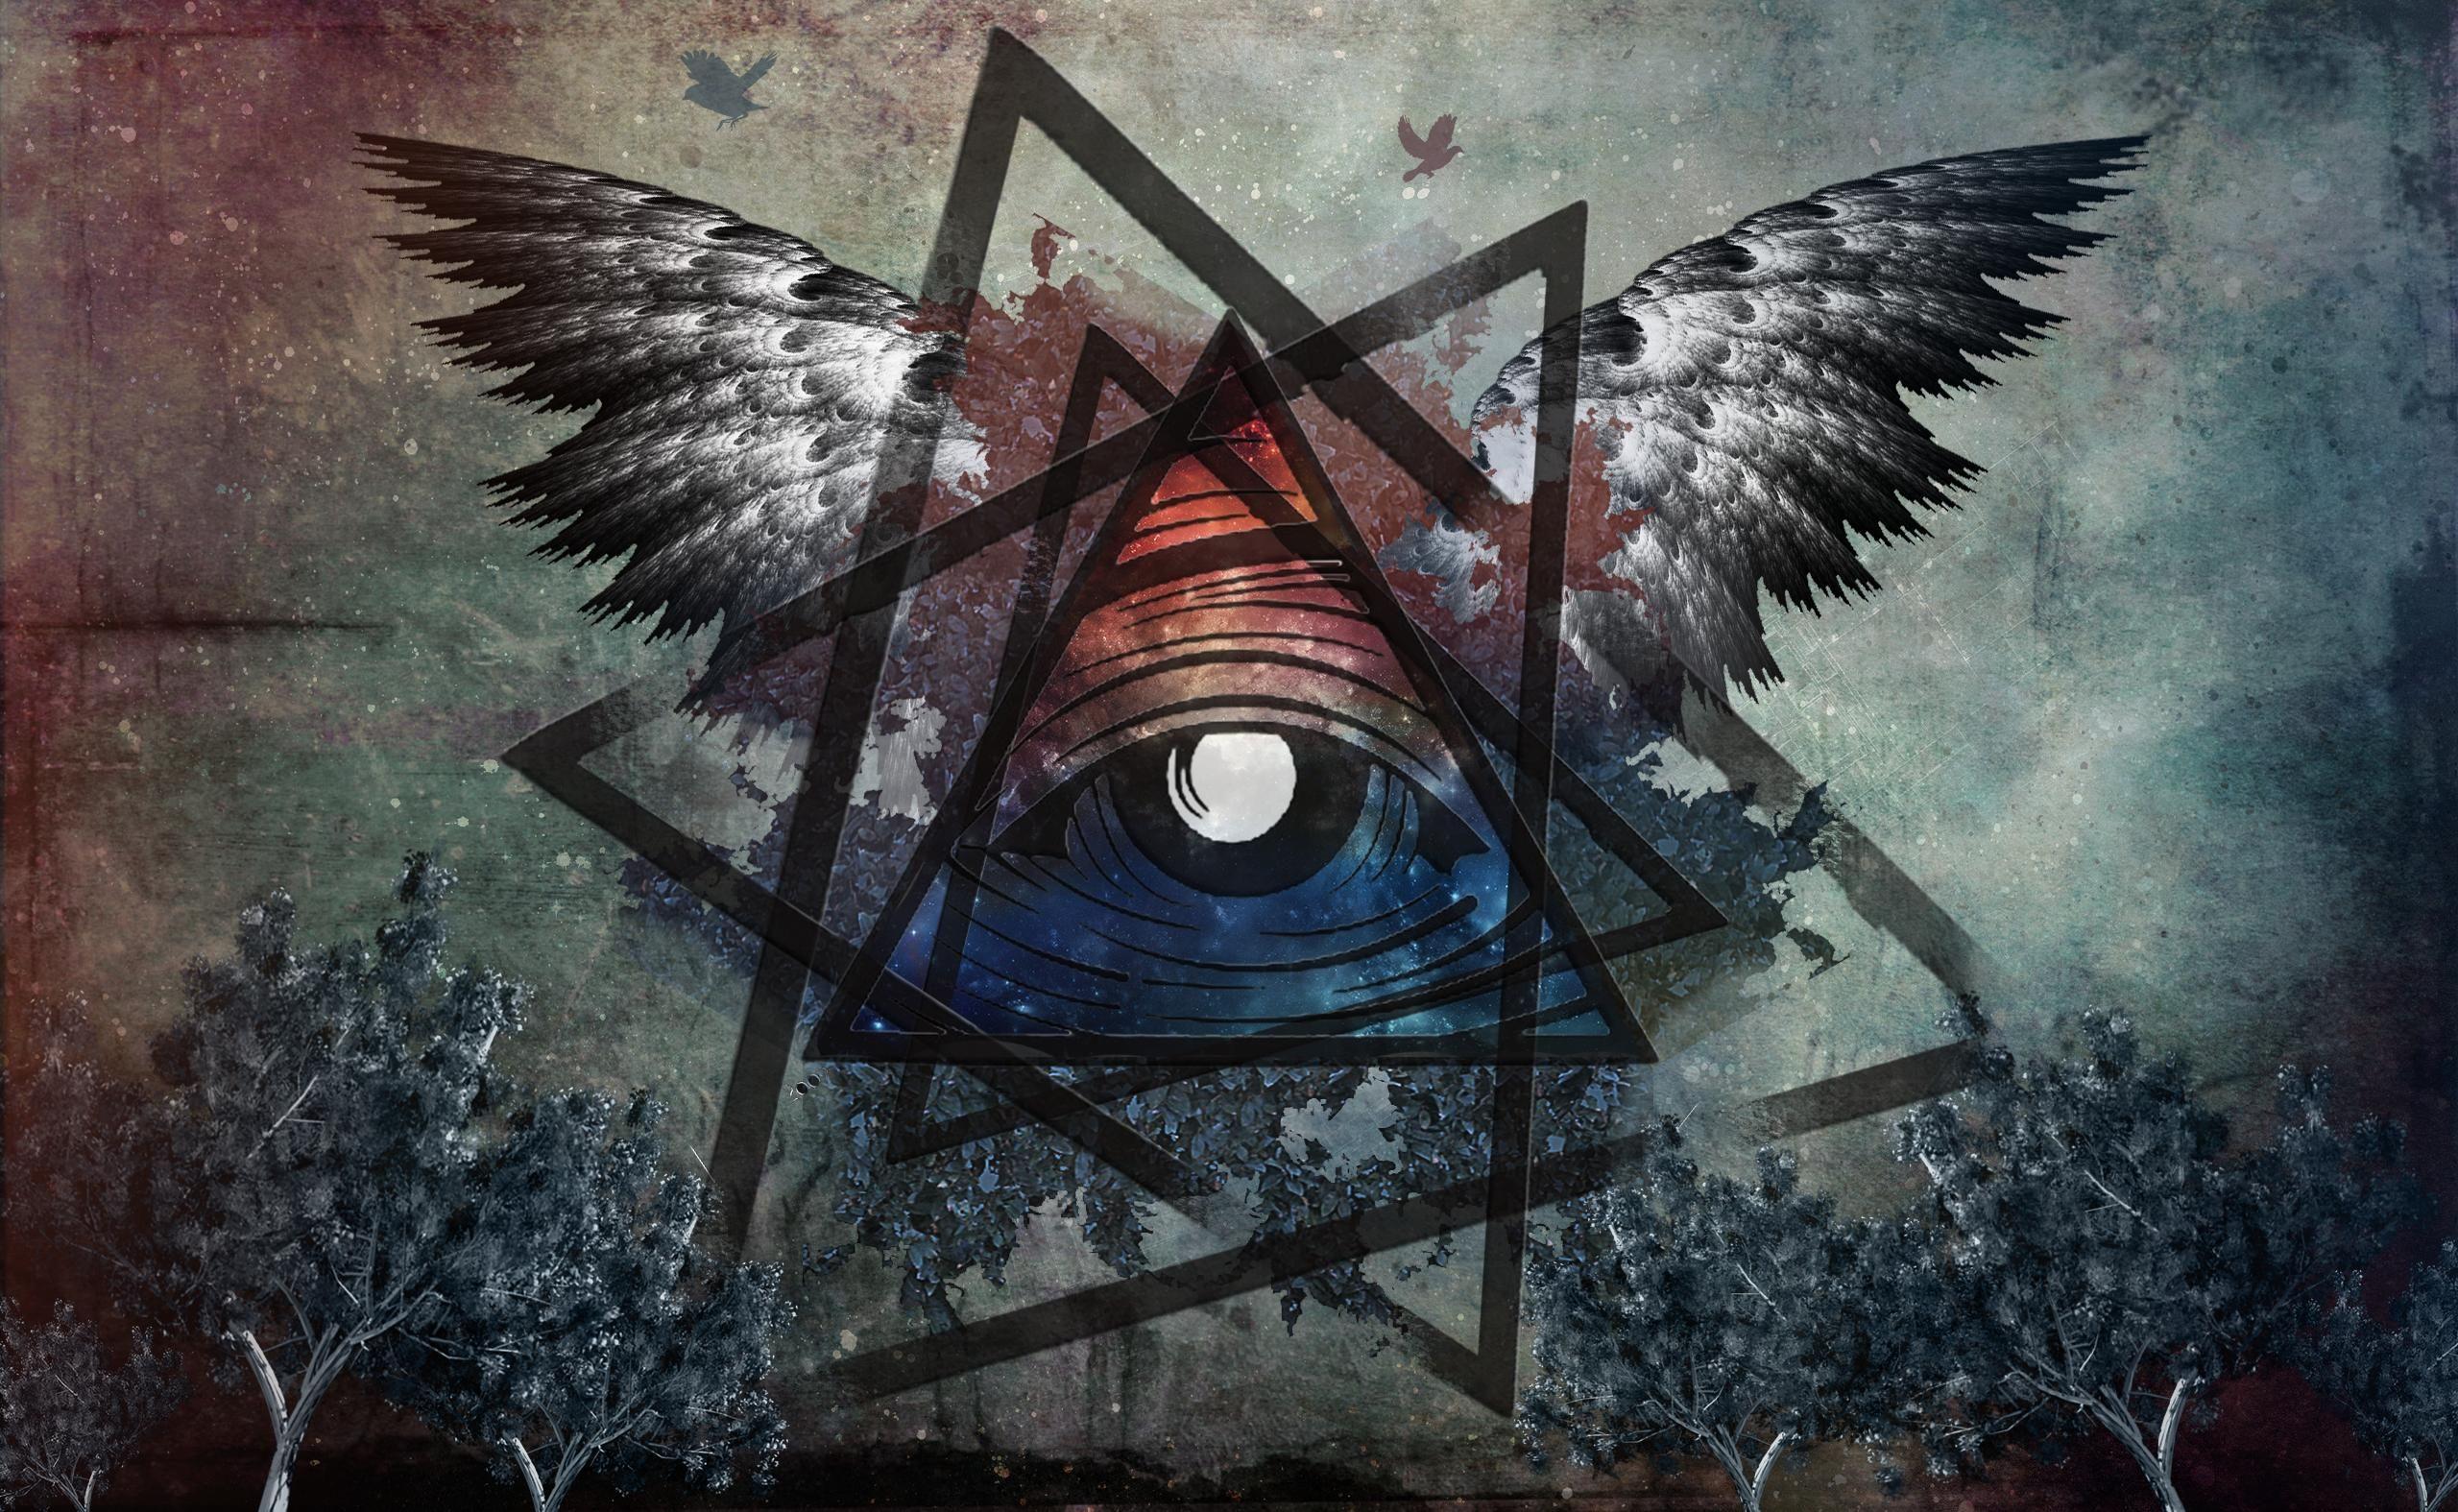 Pin De Kiko2020 Em Kiko1 Illuminati Maconaria Os Illuminati